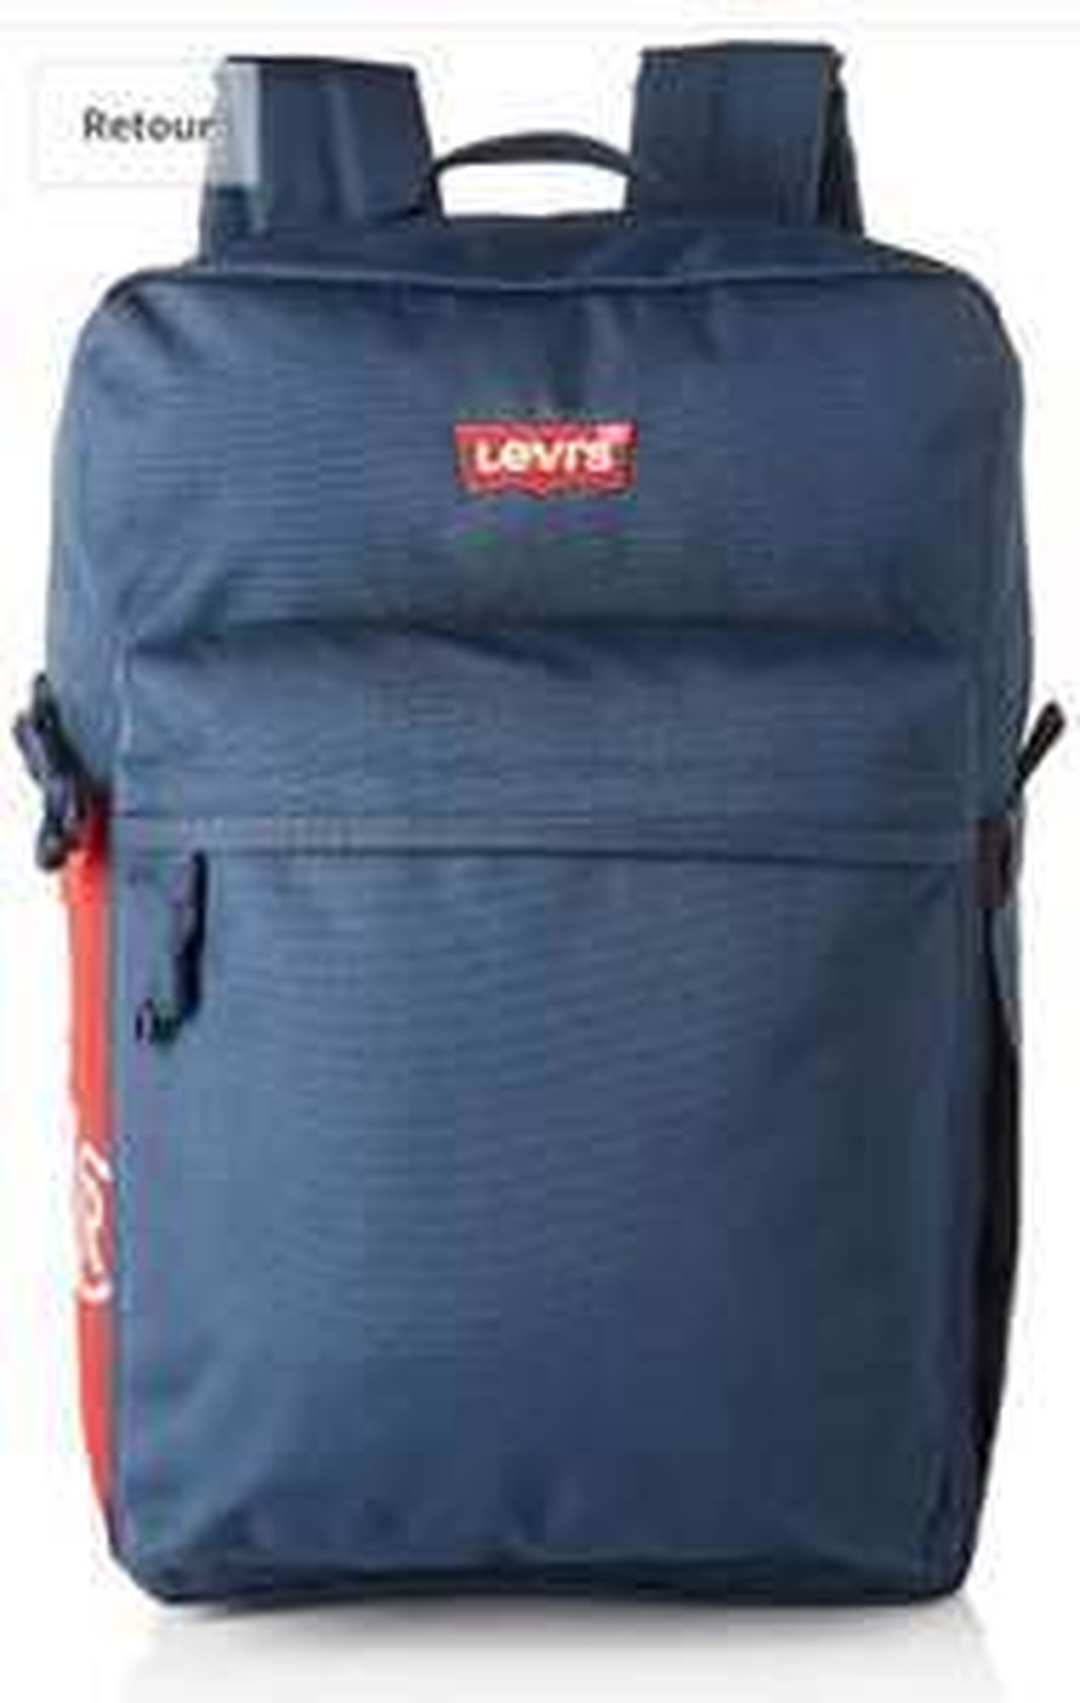 Sac à dos Levi's Updated Pack (Bleu ou noir)